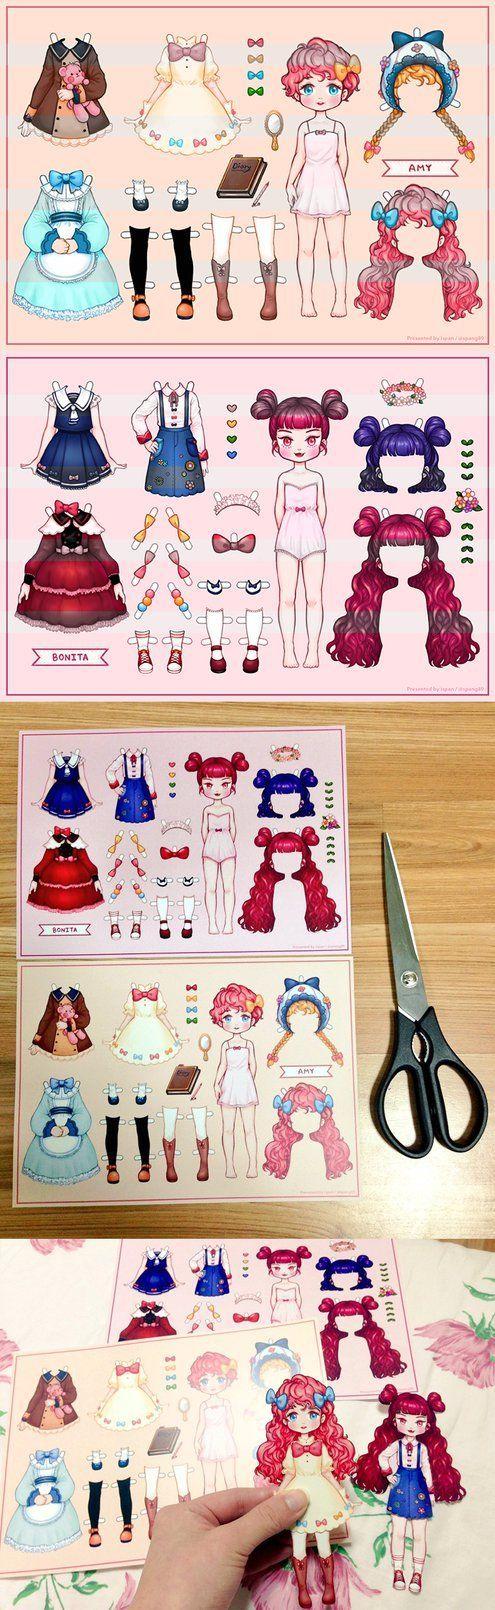 My paper dolls by ispan0w0.deviantart.com on @DeviantArt